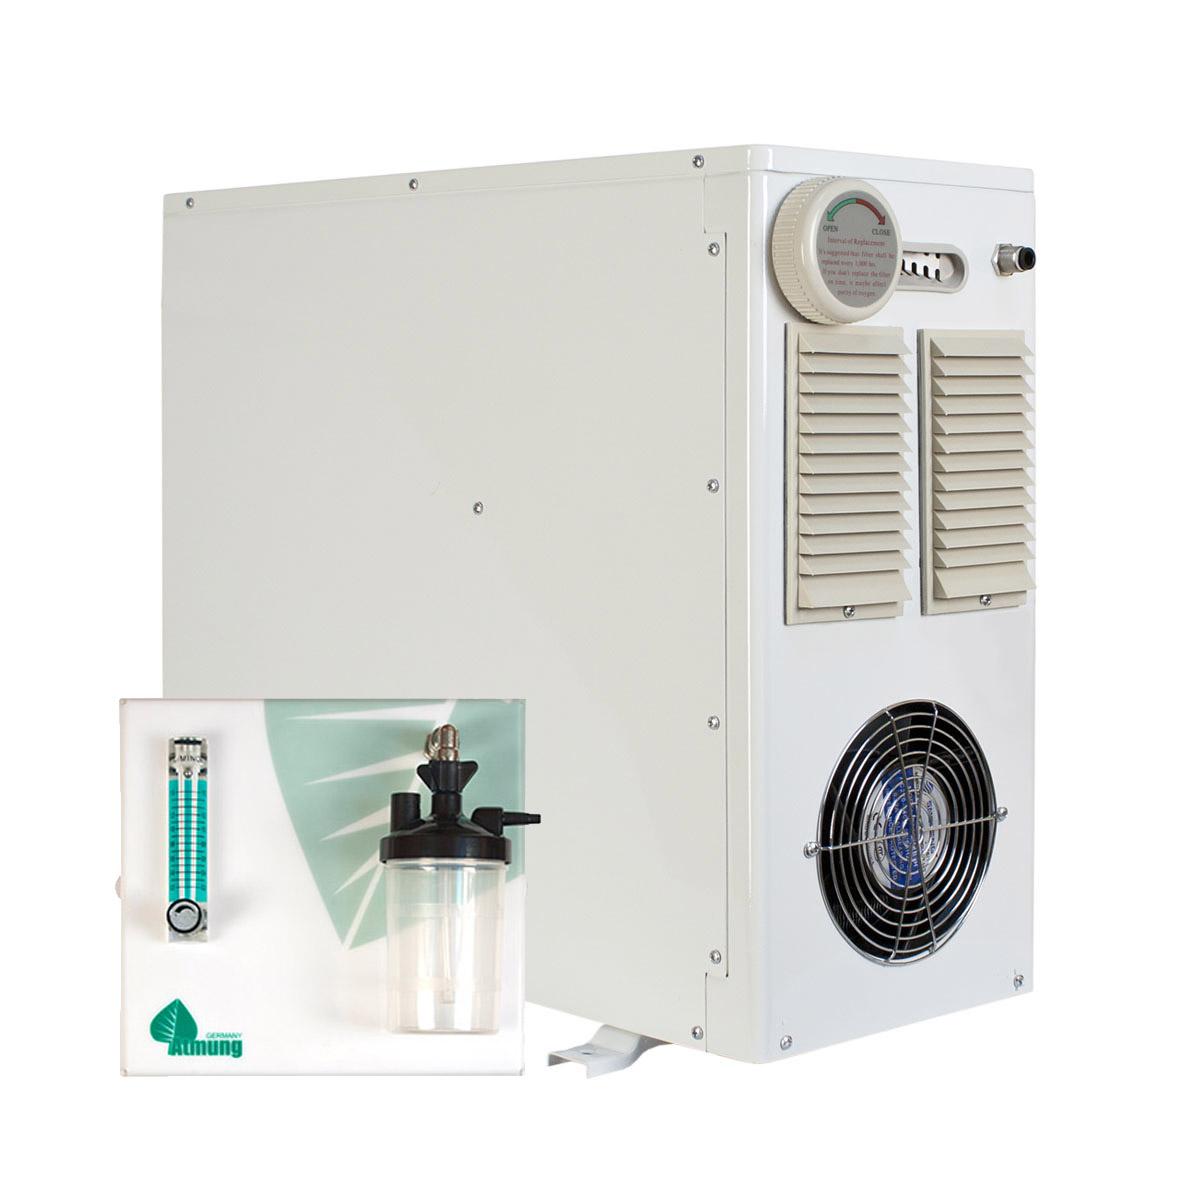 Концентратор кислорода Atmung LFY-I-5A-01 + Панель